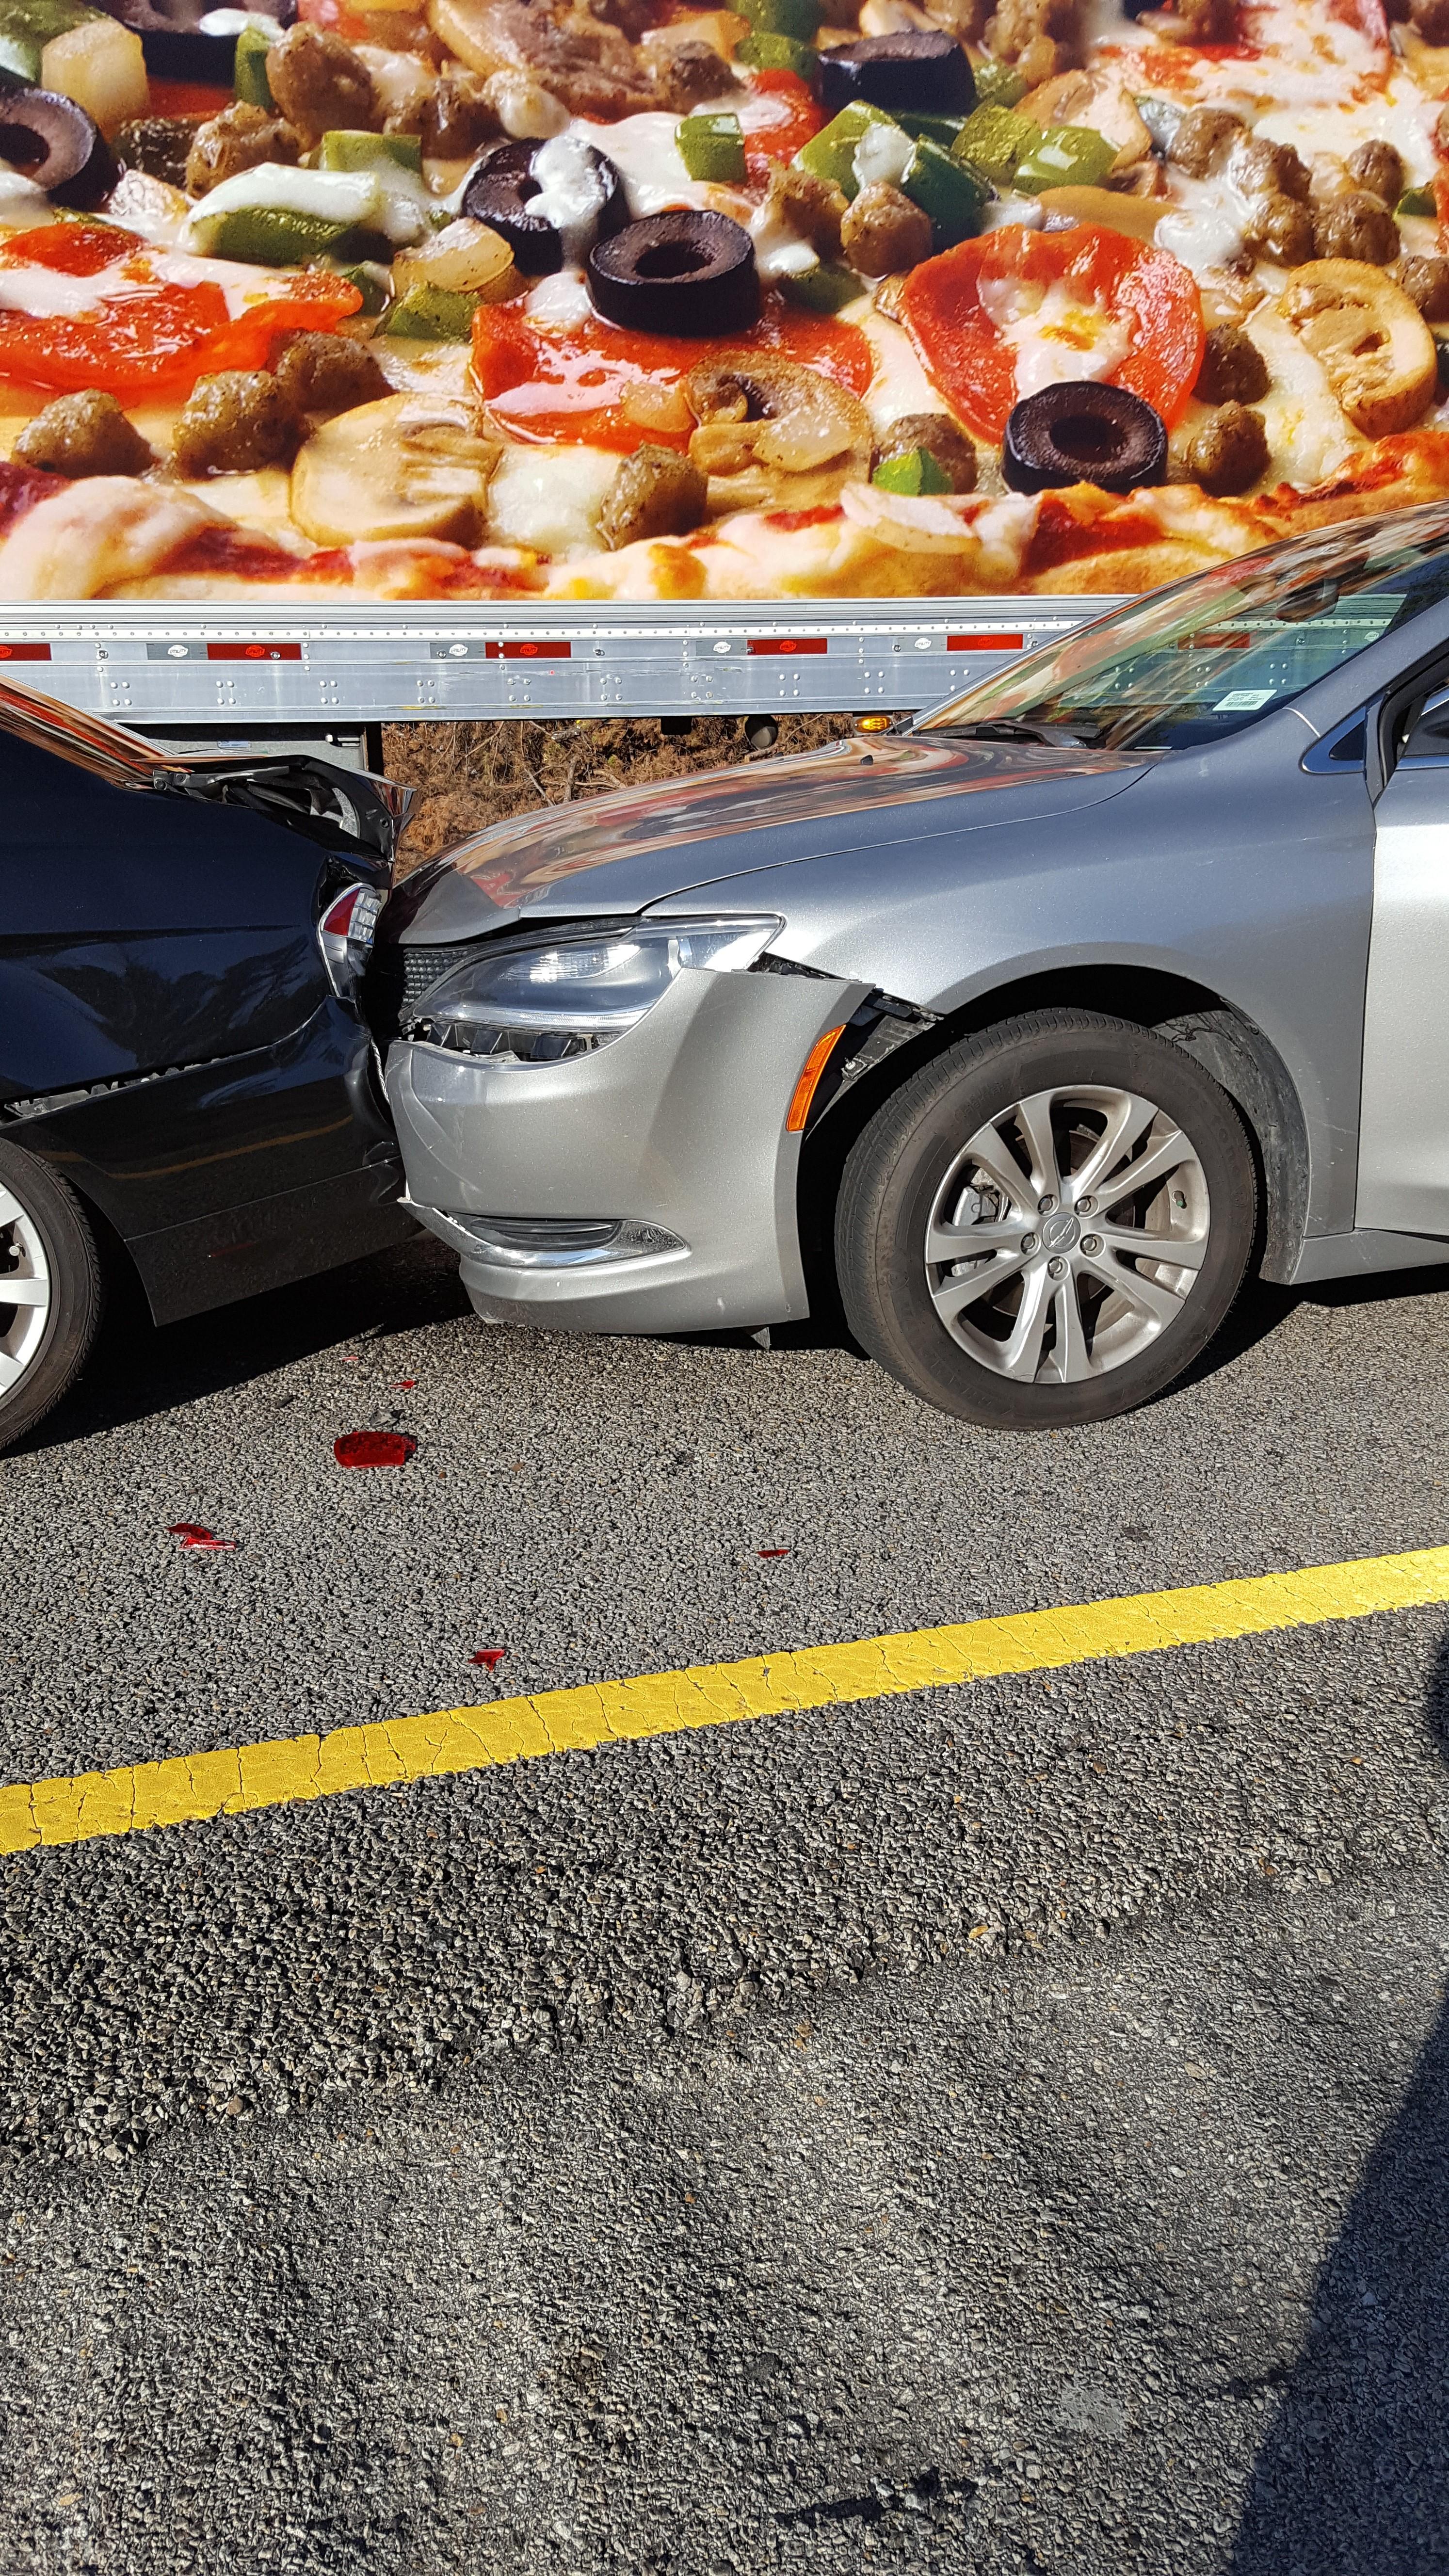 Hit & Run Auto Accident Claims